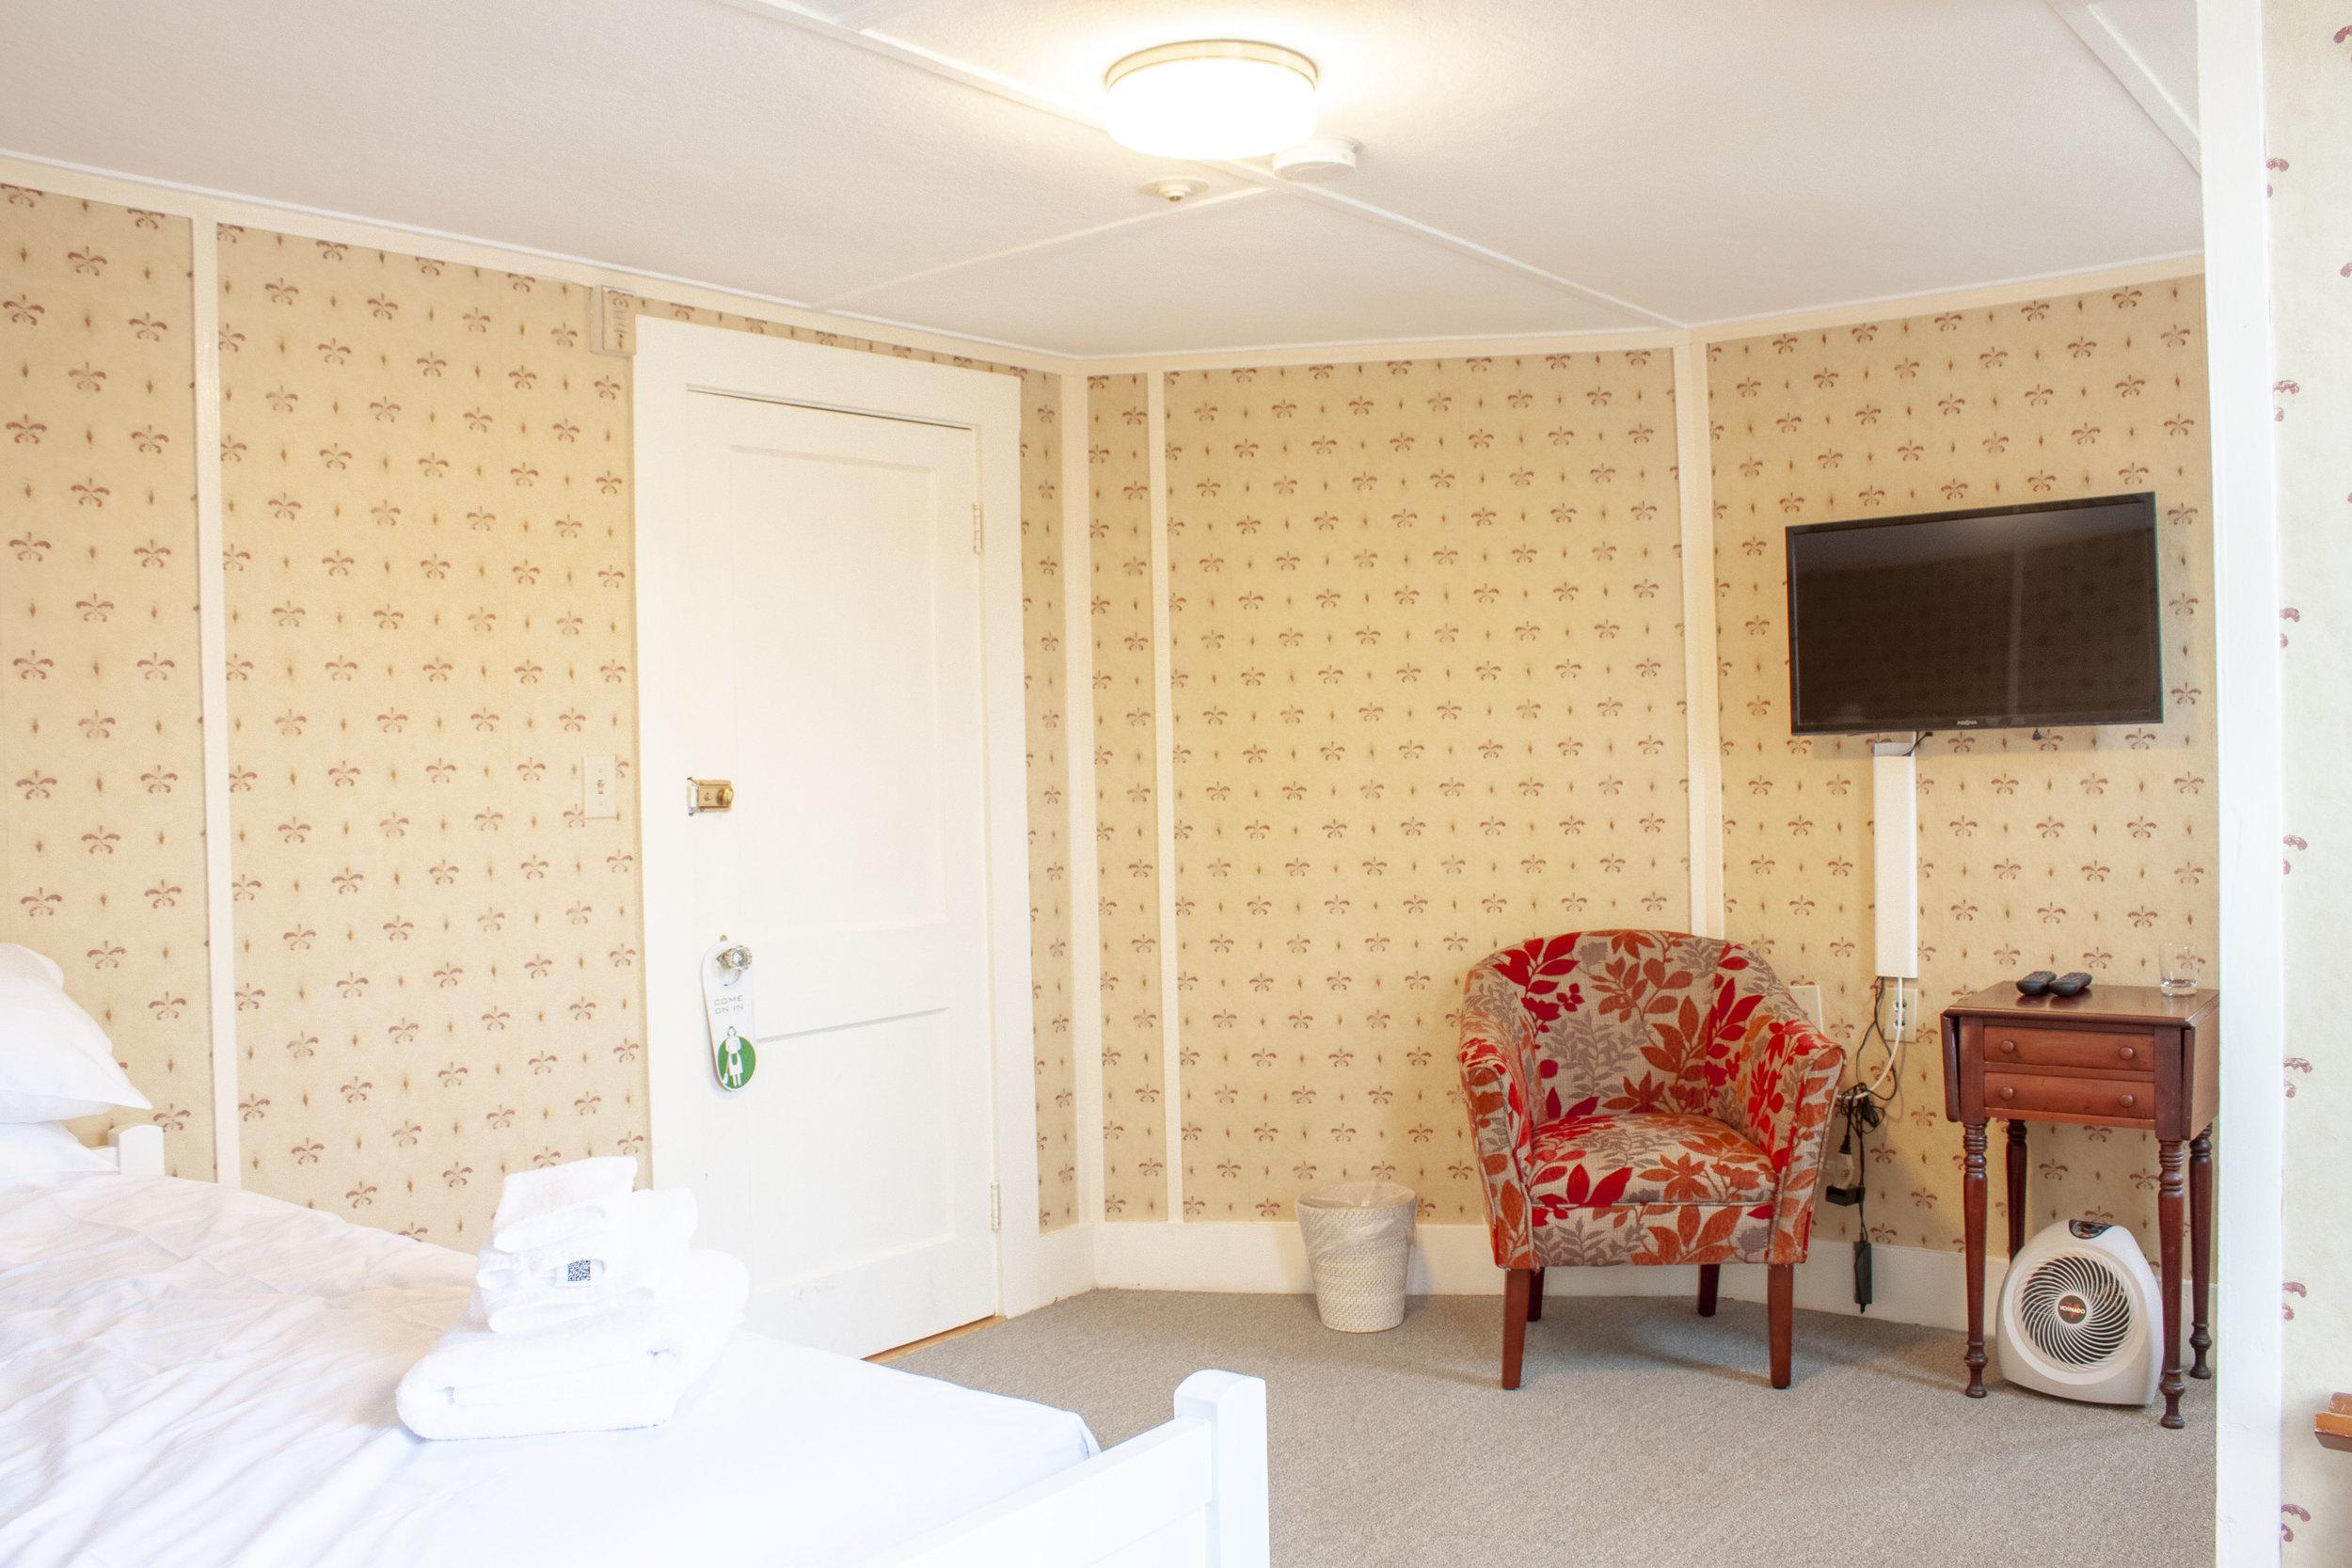 HH_Room7_3.jpg